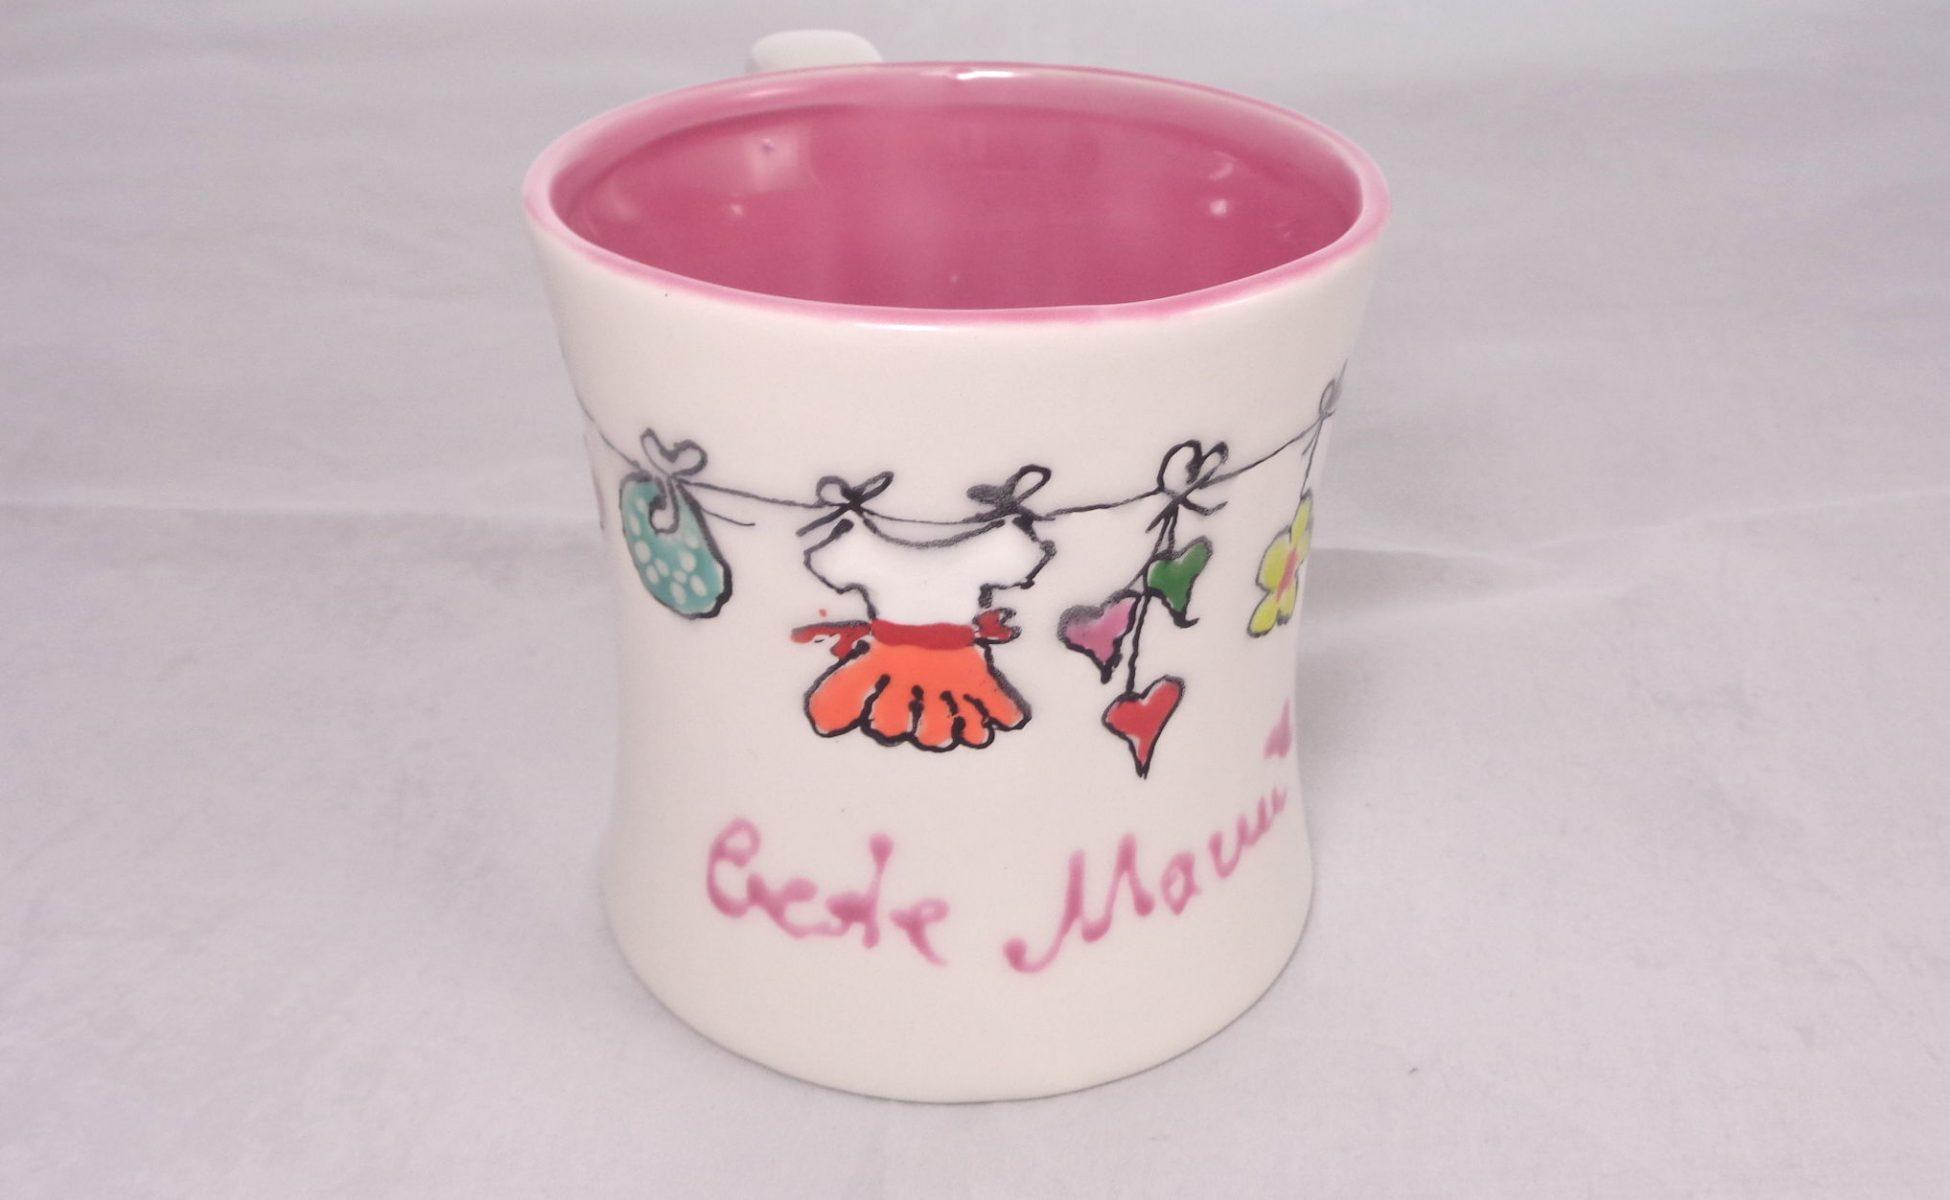 Bemalte Keramik Kaffeebecher beste Mama